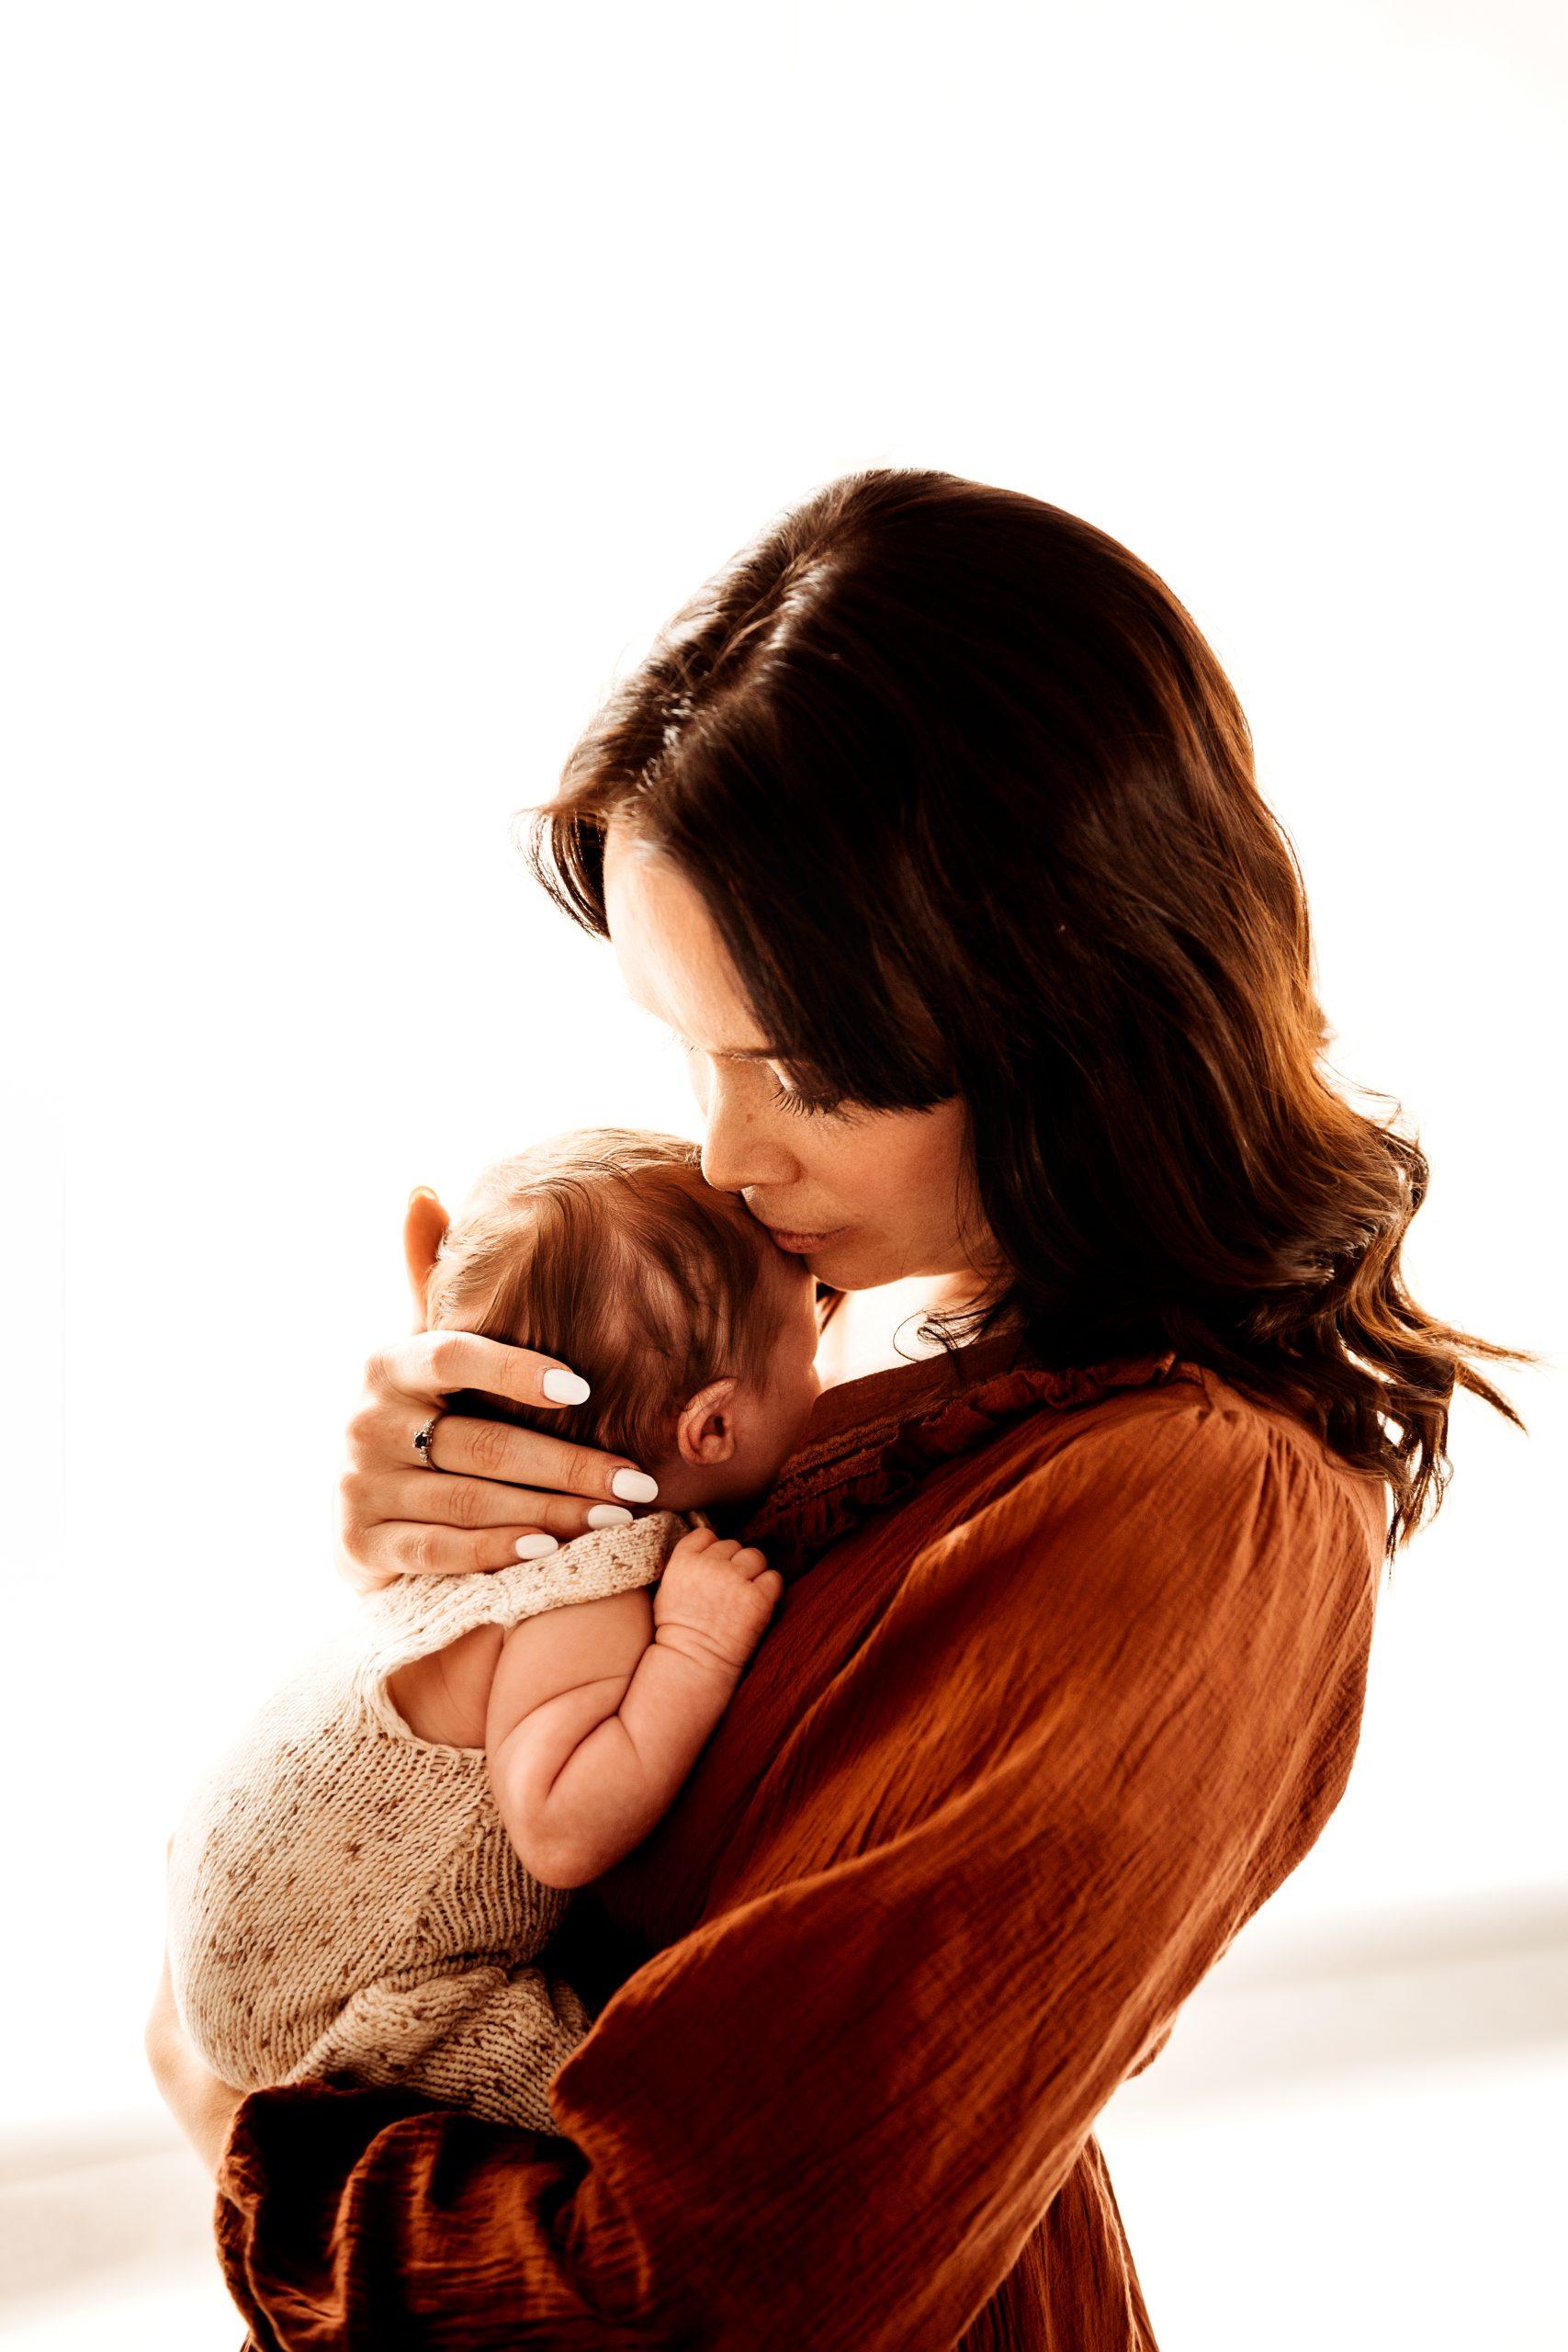 canberra newborn photographer expecting mum and dad cuddling